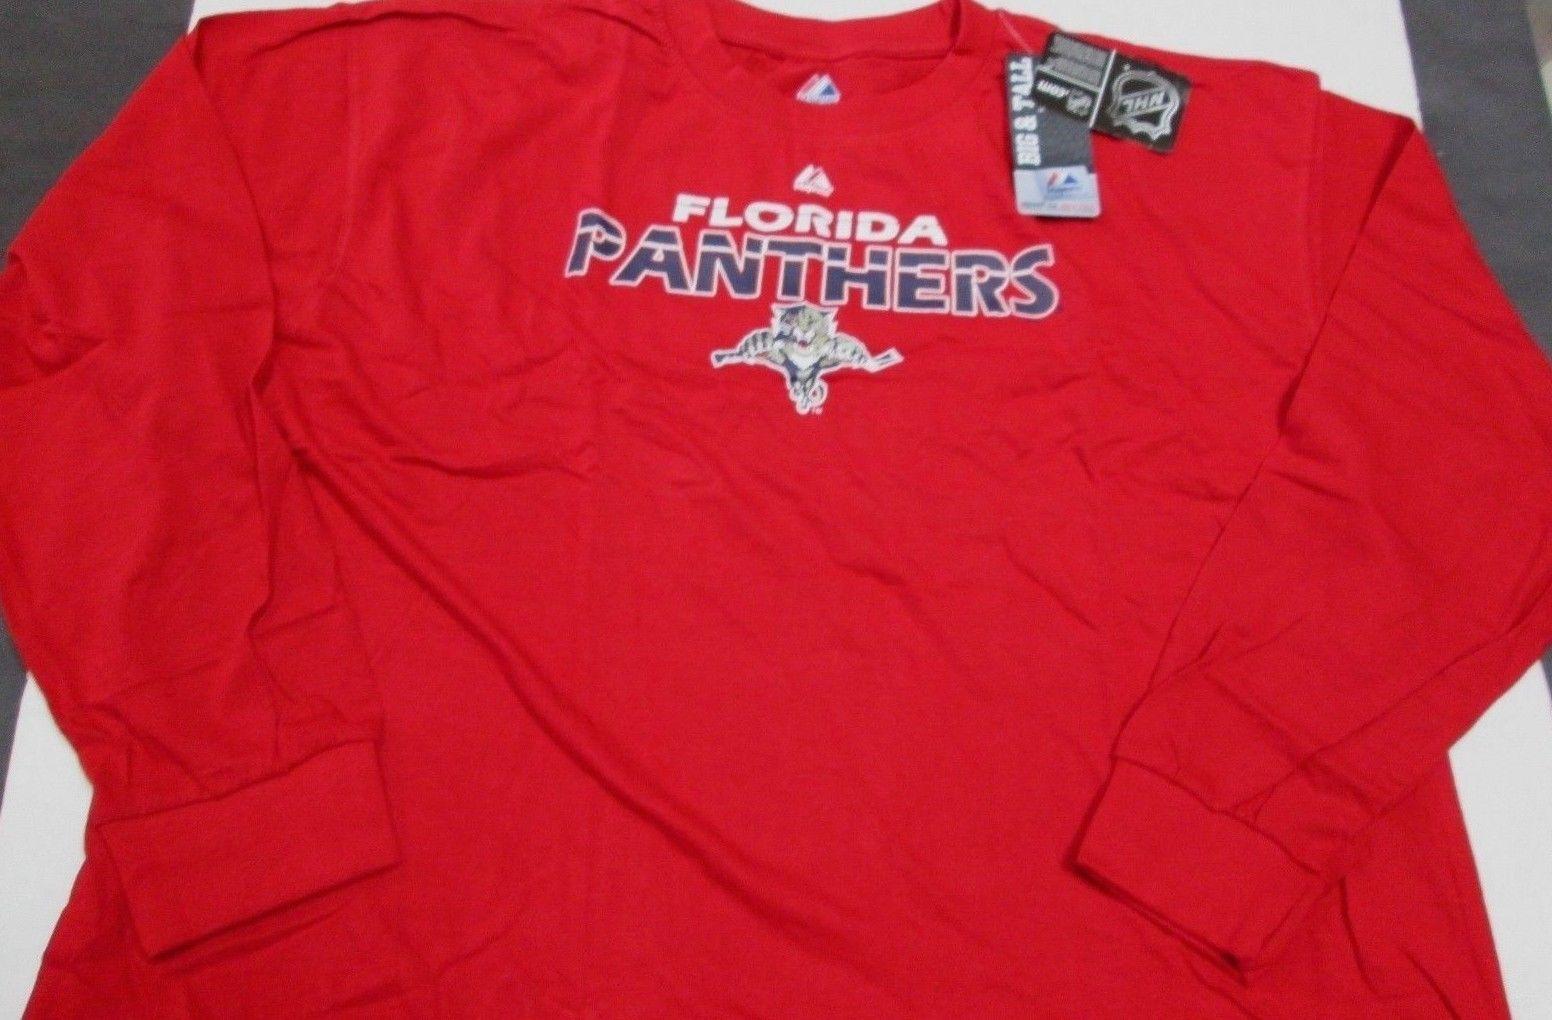 separation shoes 735ef 88b0e BRAND NEW NHL MEN'S FLORIDA PANTHERS LONG SLEEVE COTTON LOGO ...